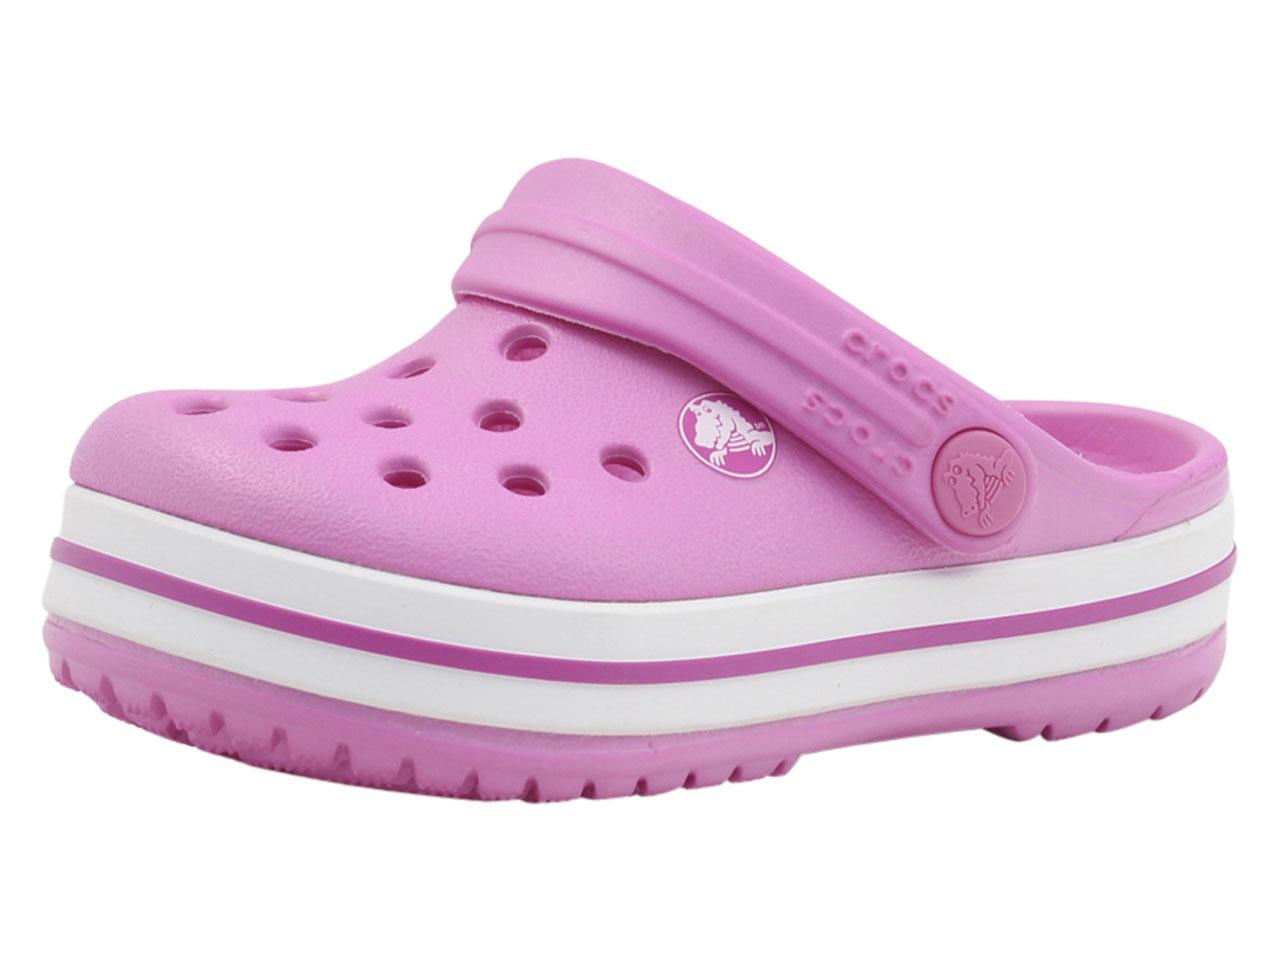 74ece86677f3 Crocs Kids Crocband Clog Party Pink Croslite Sandals 12 US Little ...